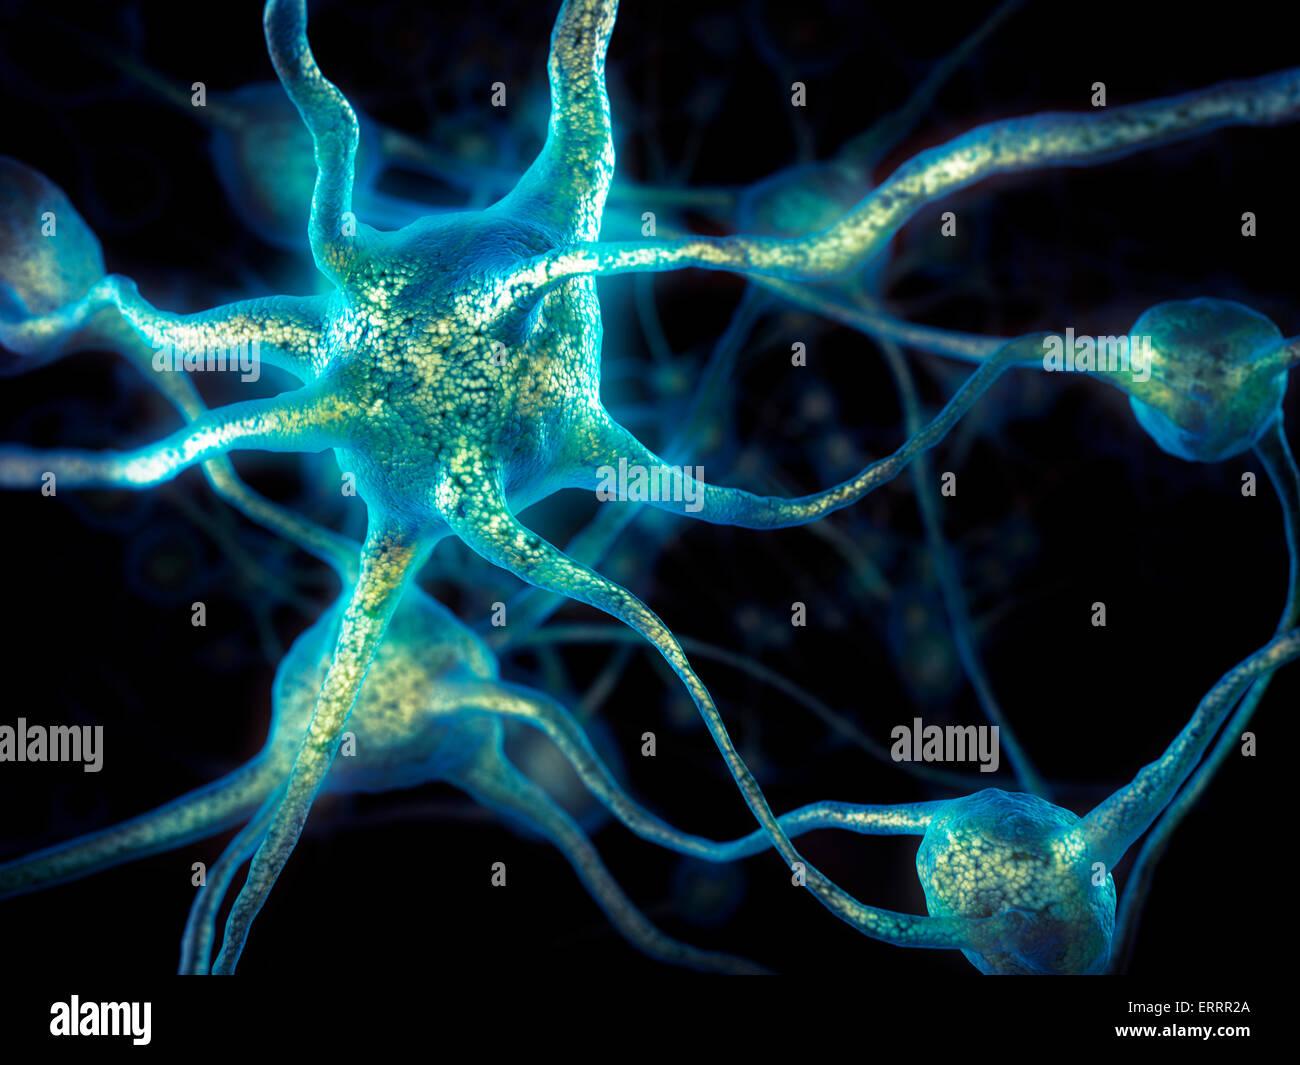 Network of neurons, Brain cells, nervous system, conceptual 3D illustration - Stock Image